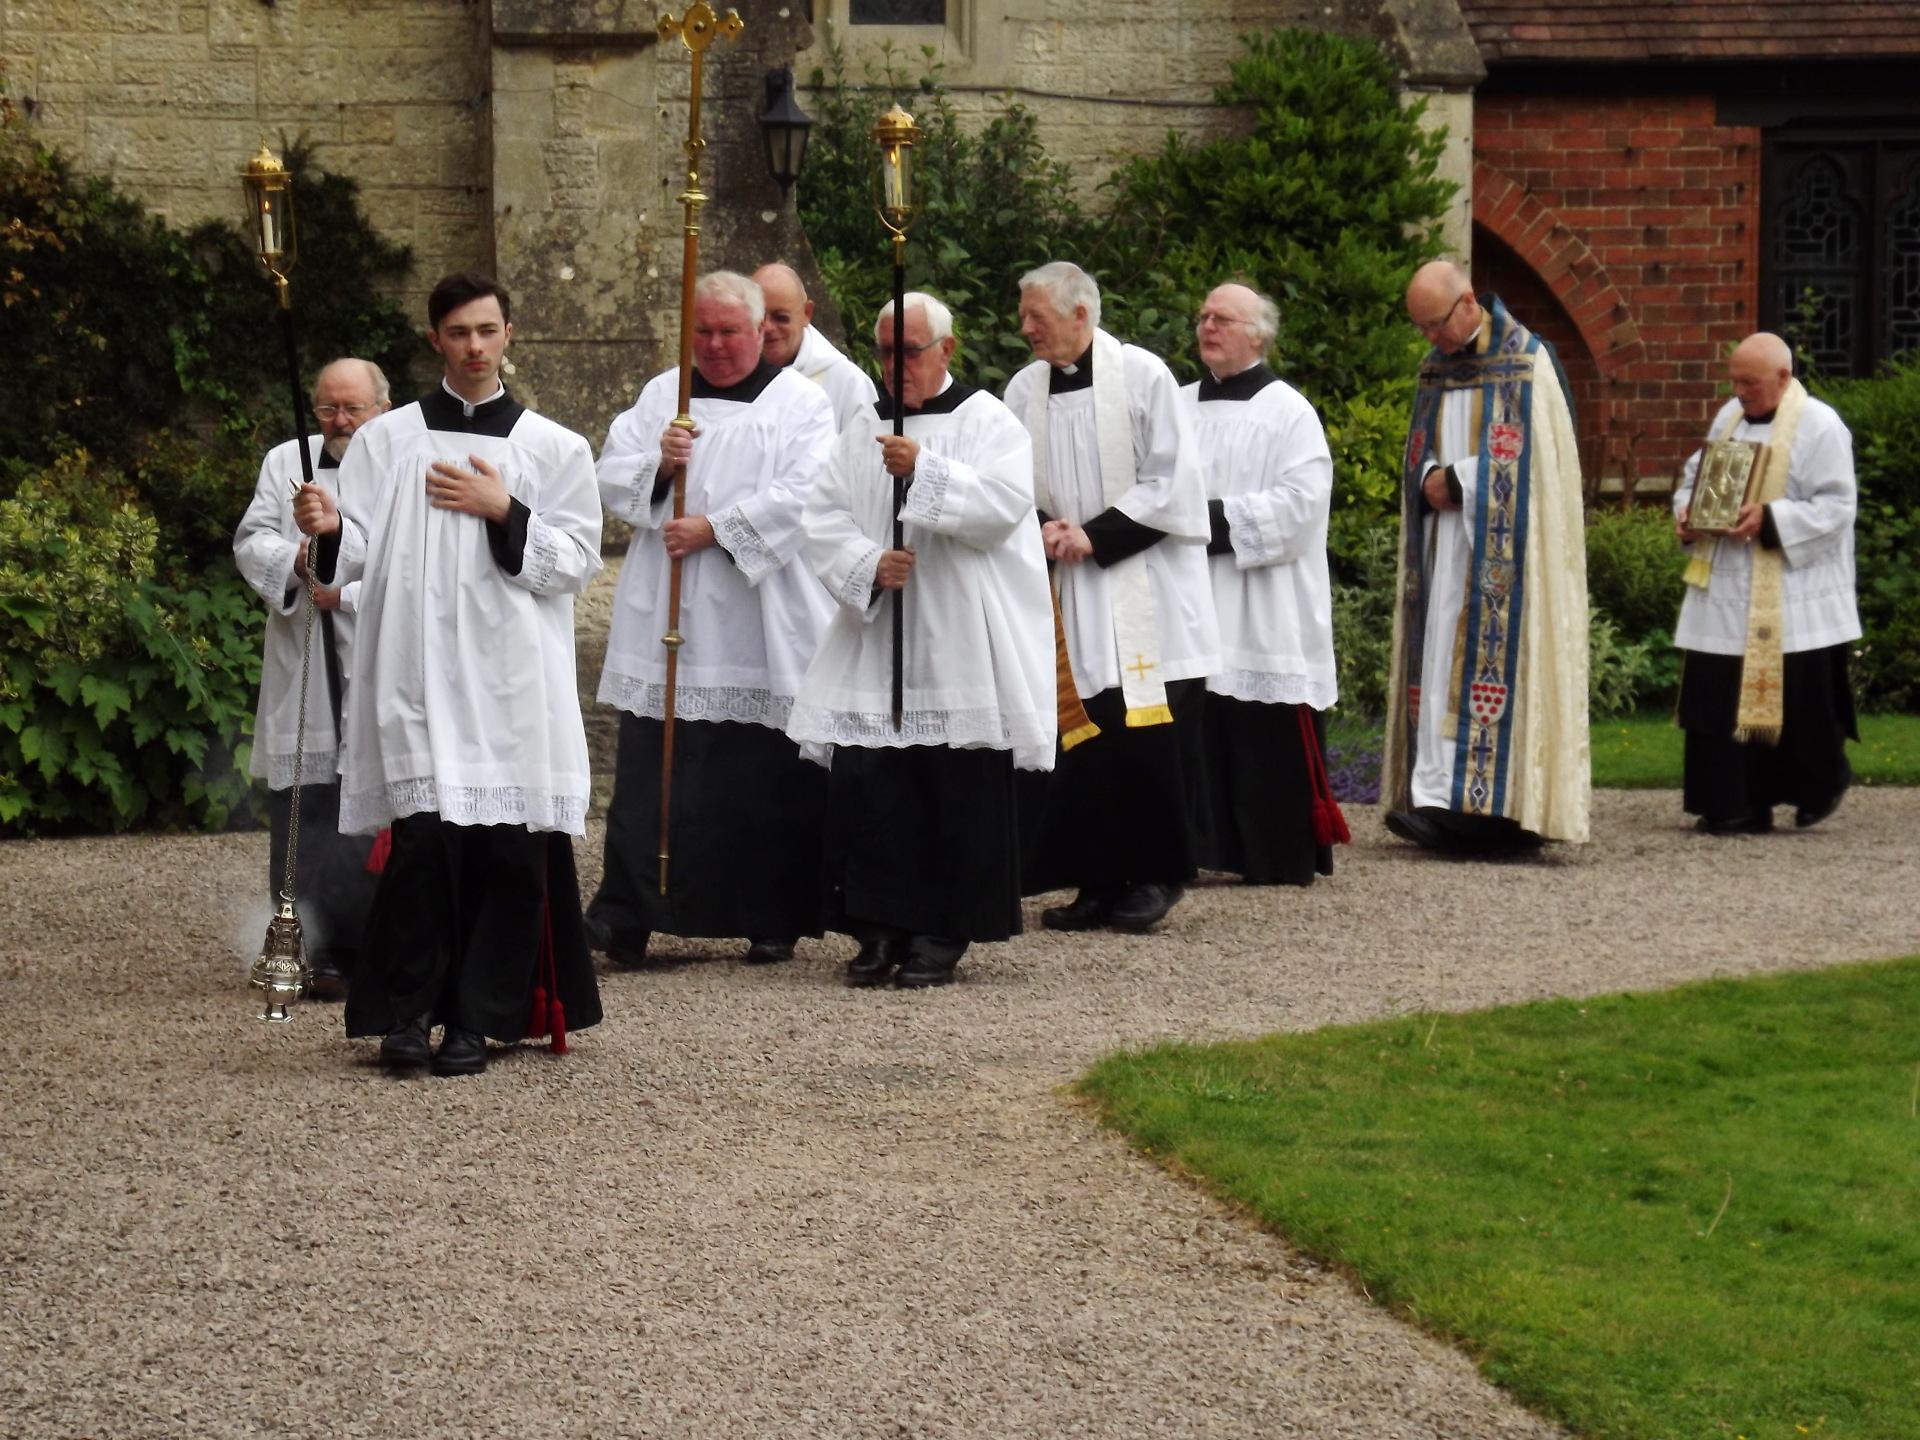 The procession makes its way across the Quadrangle